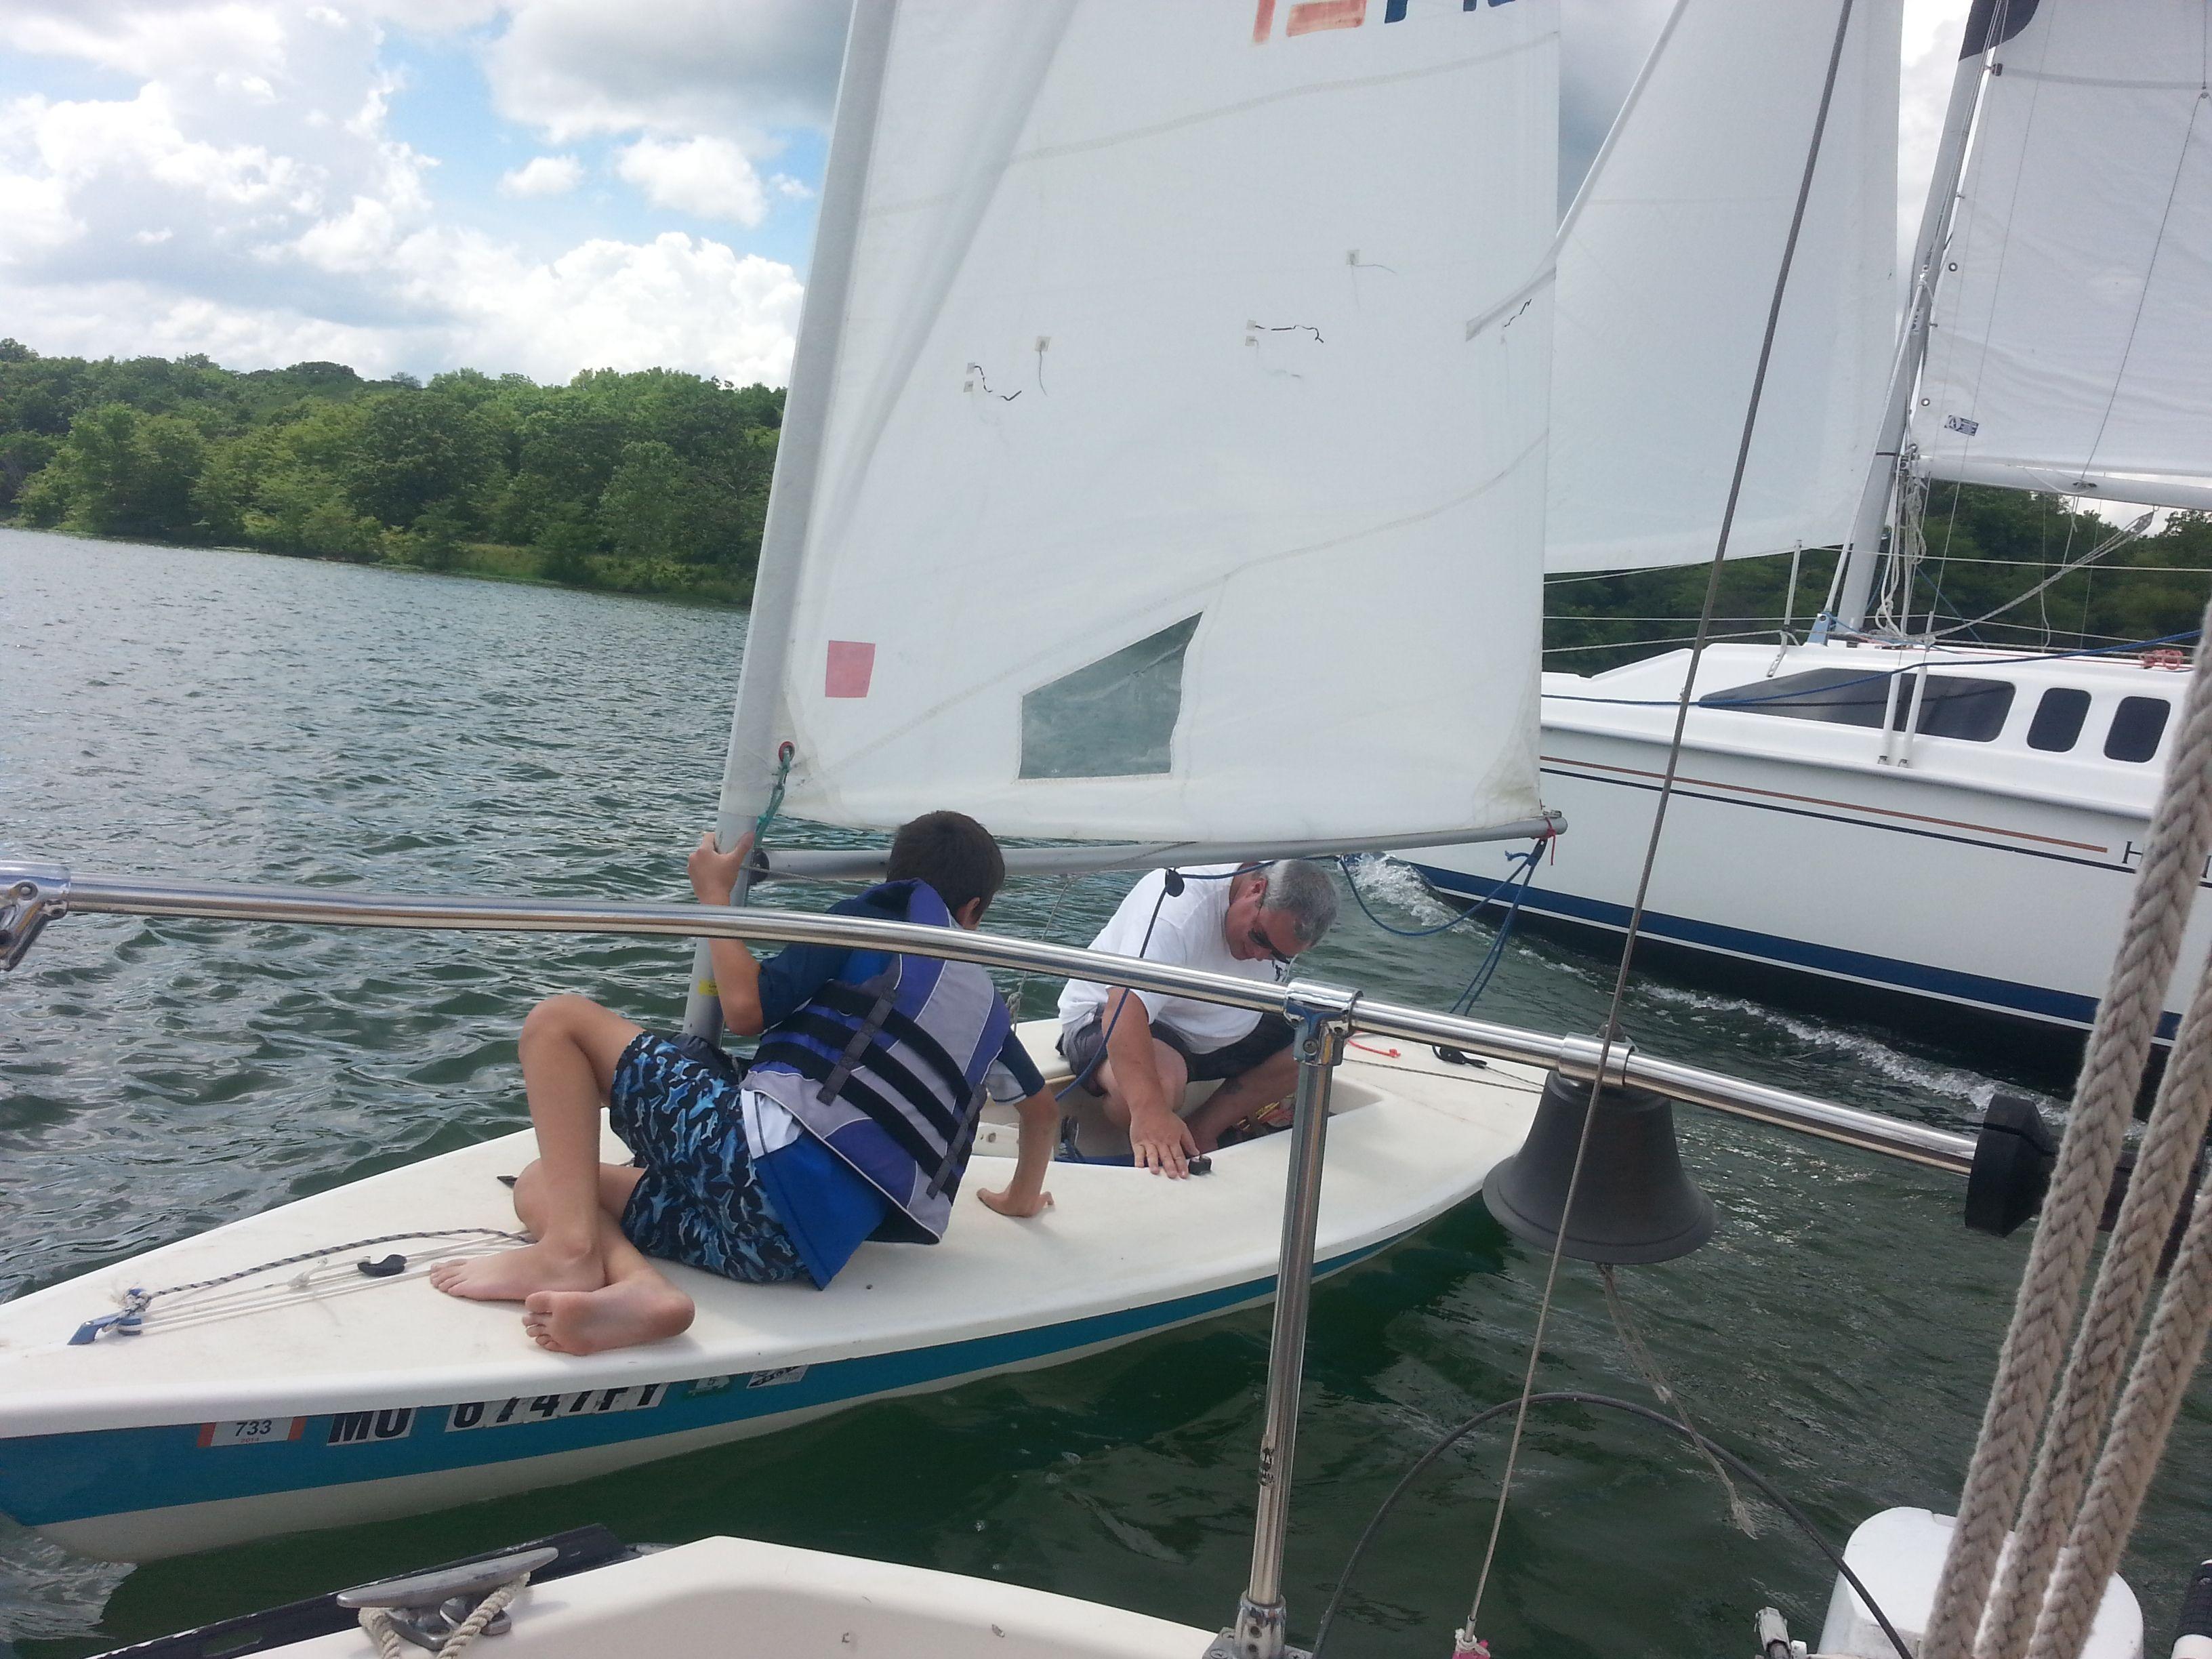 yacht club lawrence ks